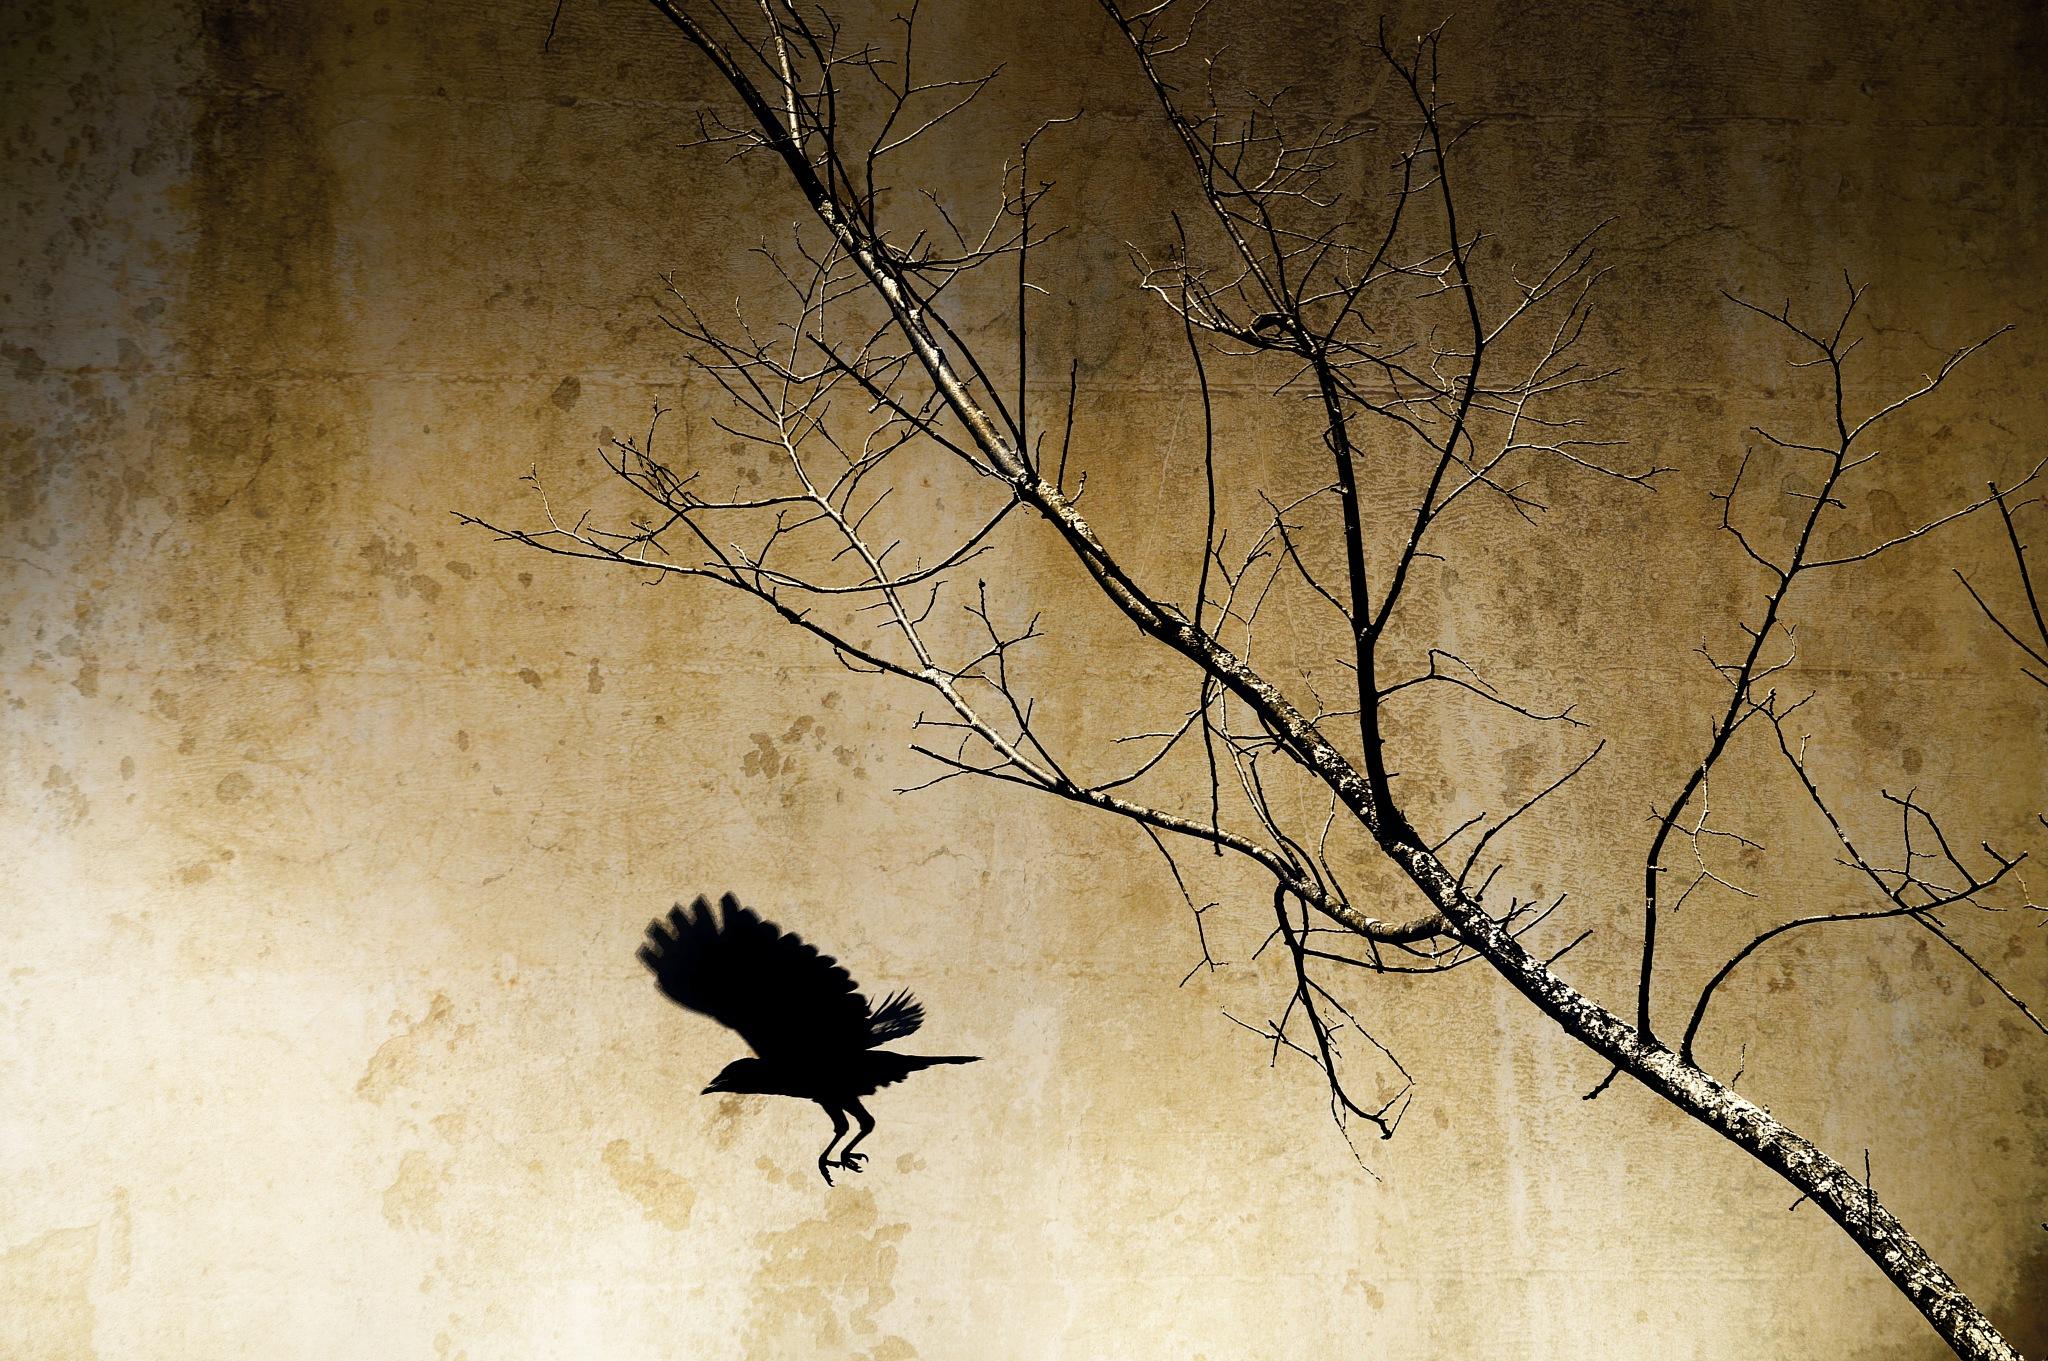 The crow by sylviecorriveau